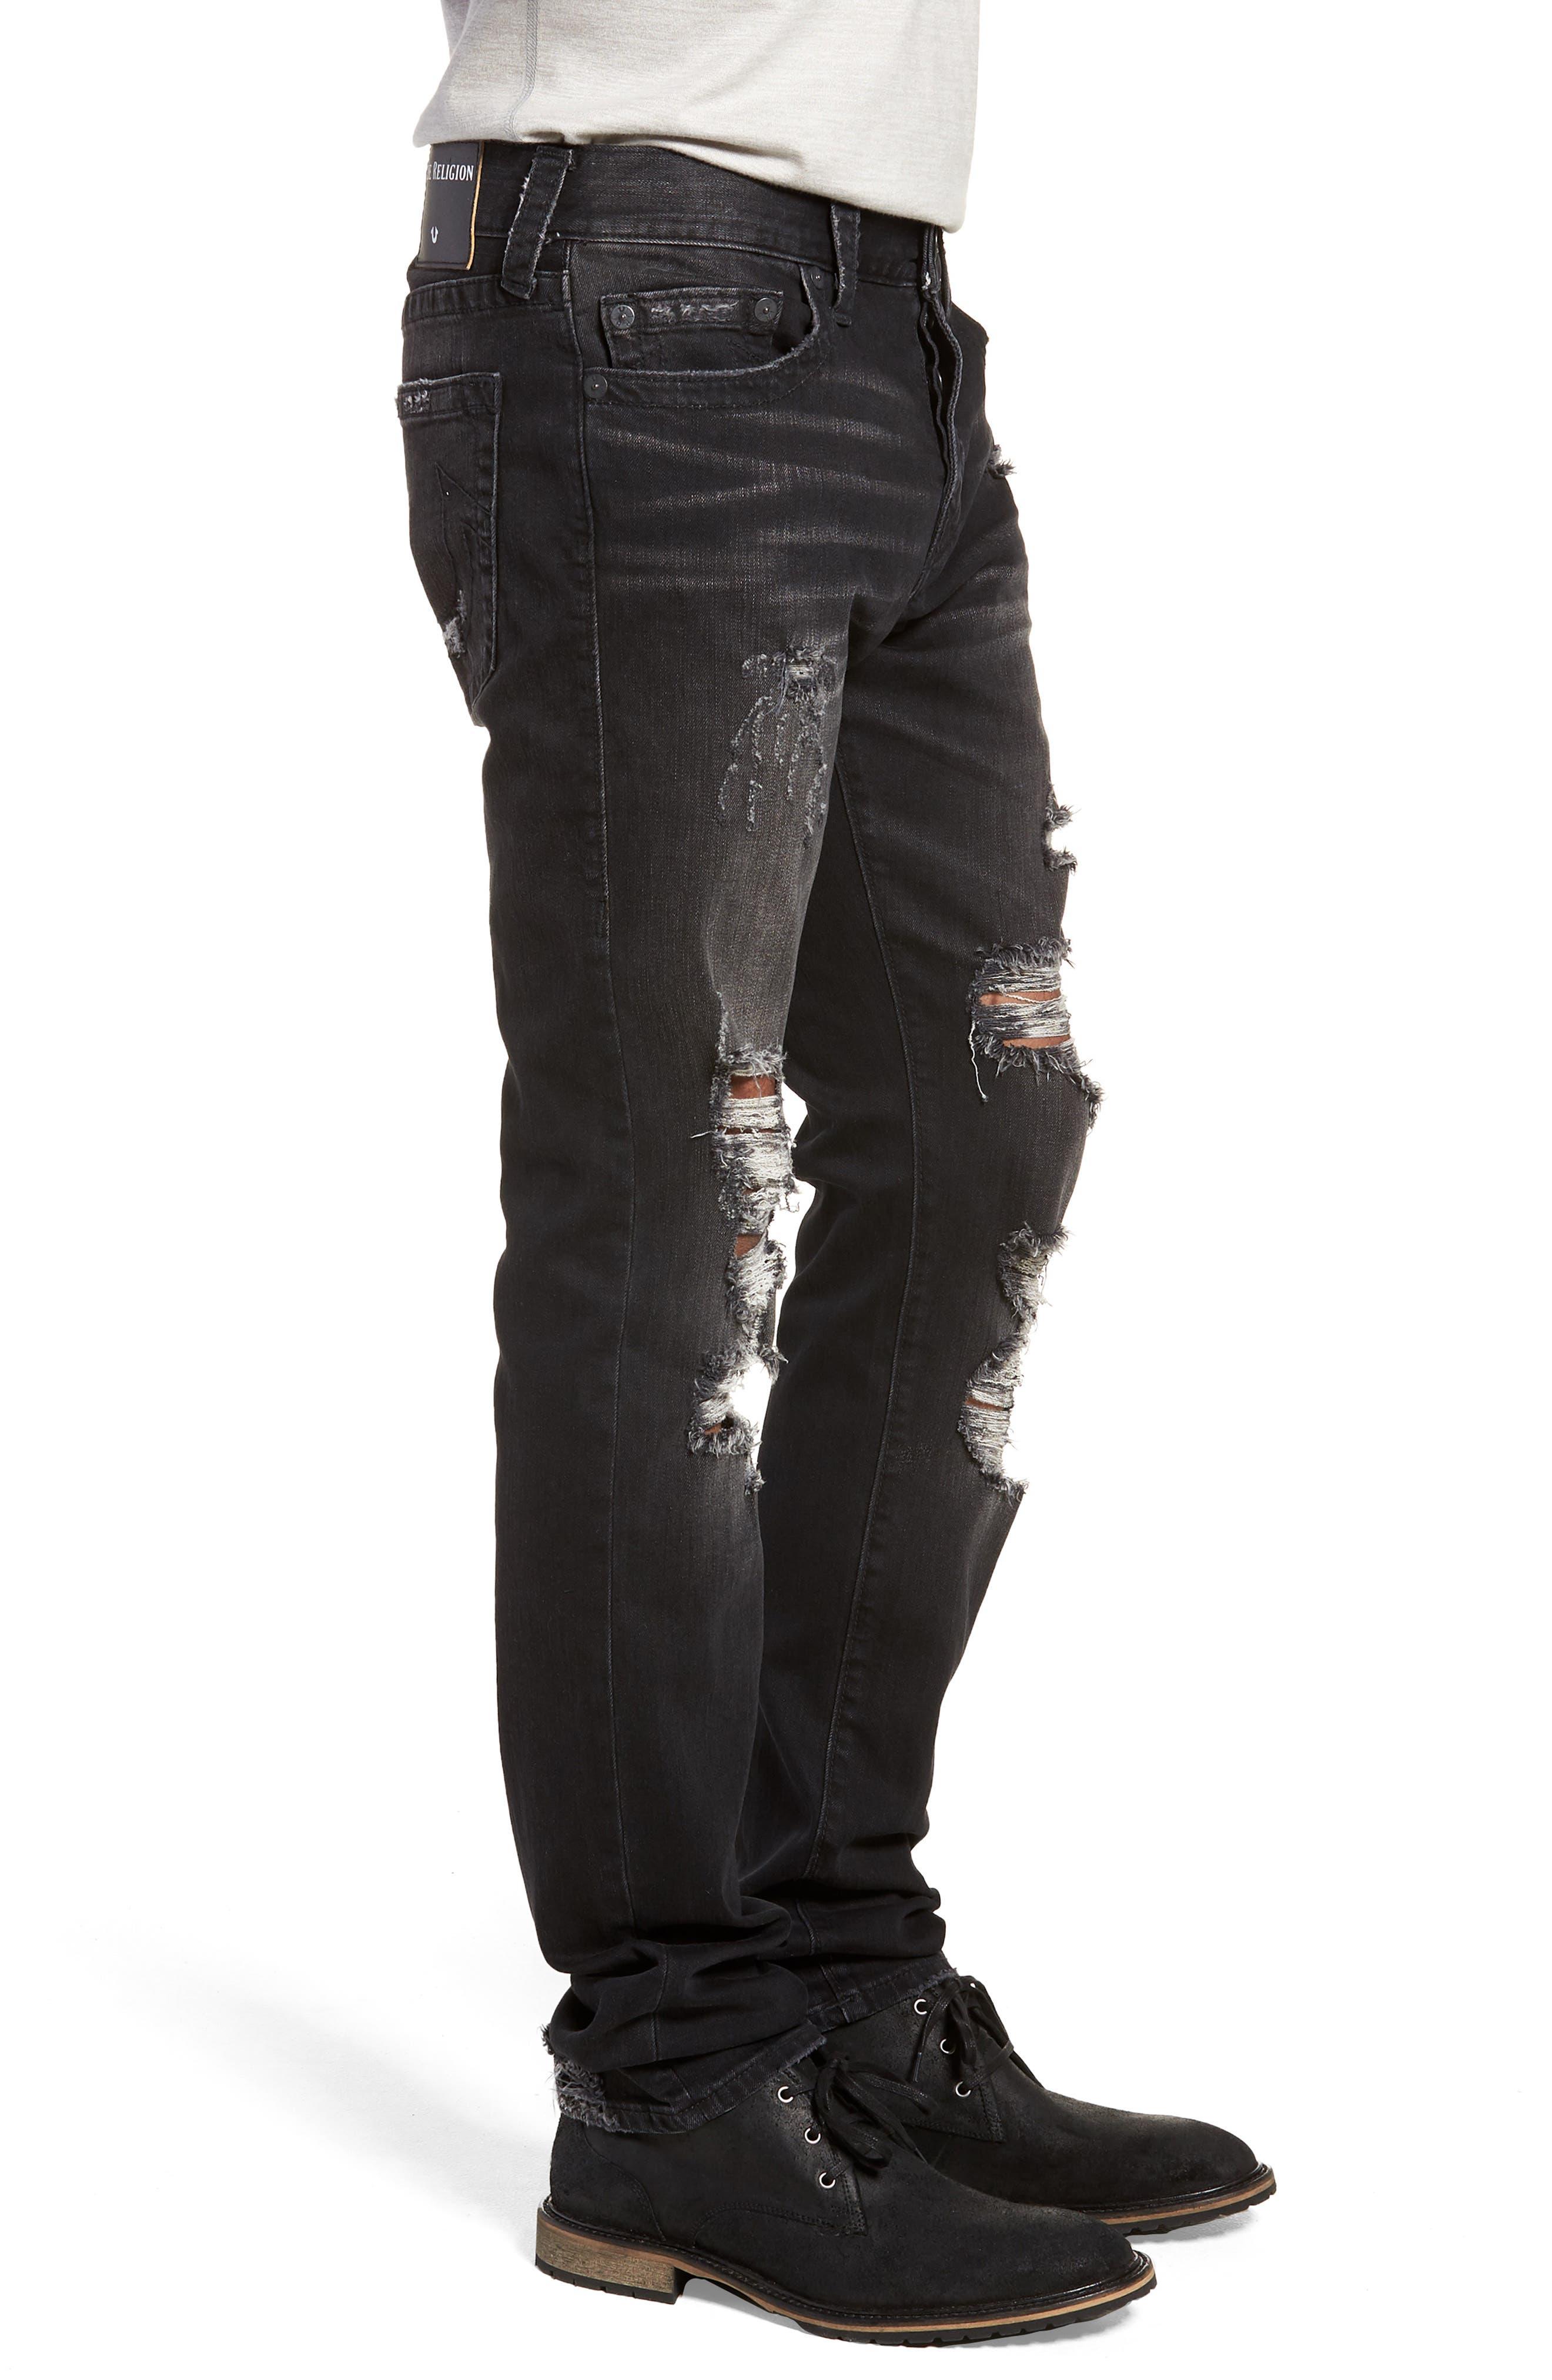 Rocco Skinny Fit Jeans,                             Alternate thumbnail 3, color,                             EQYD DARK STREET